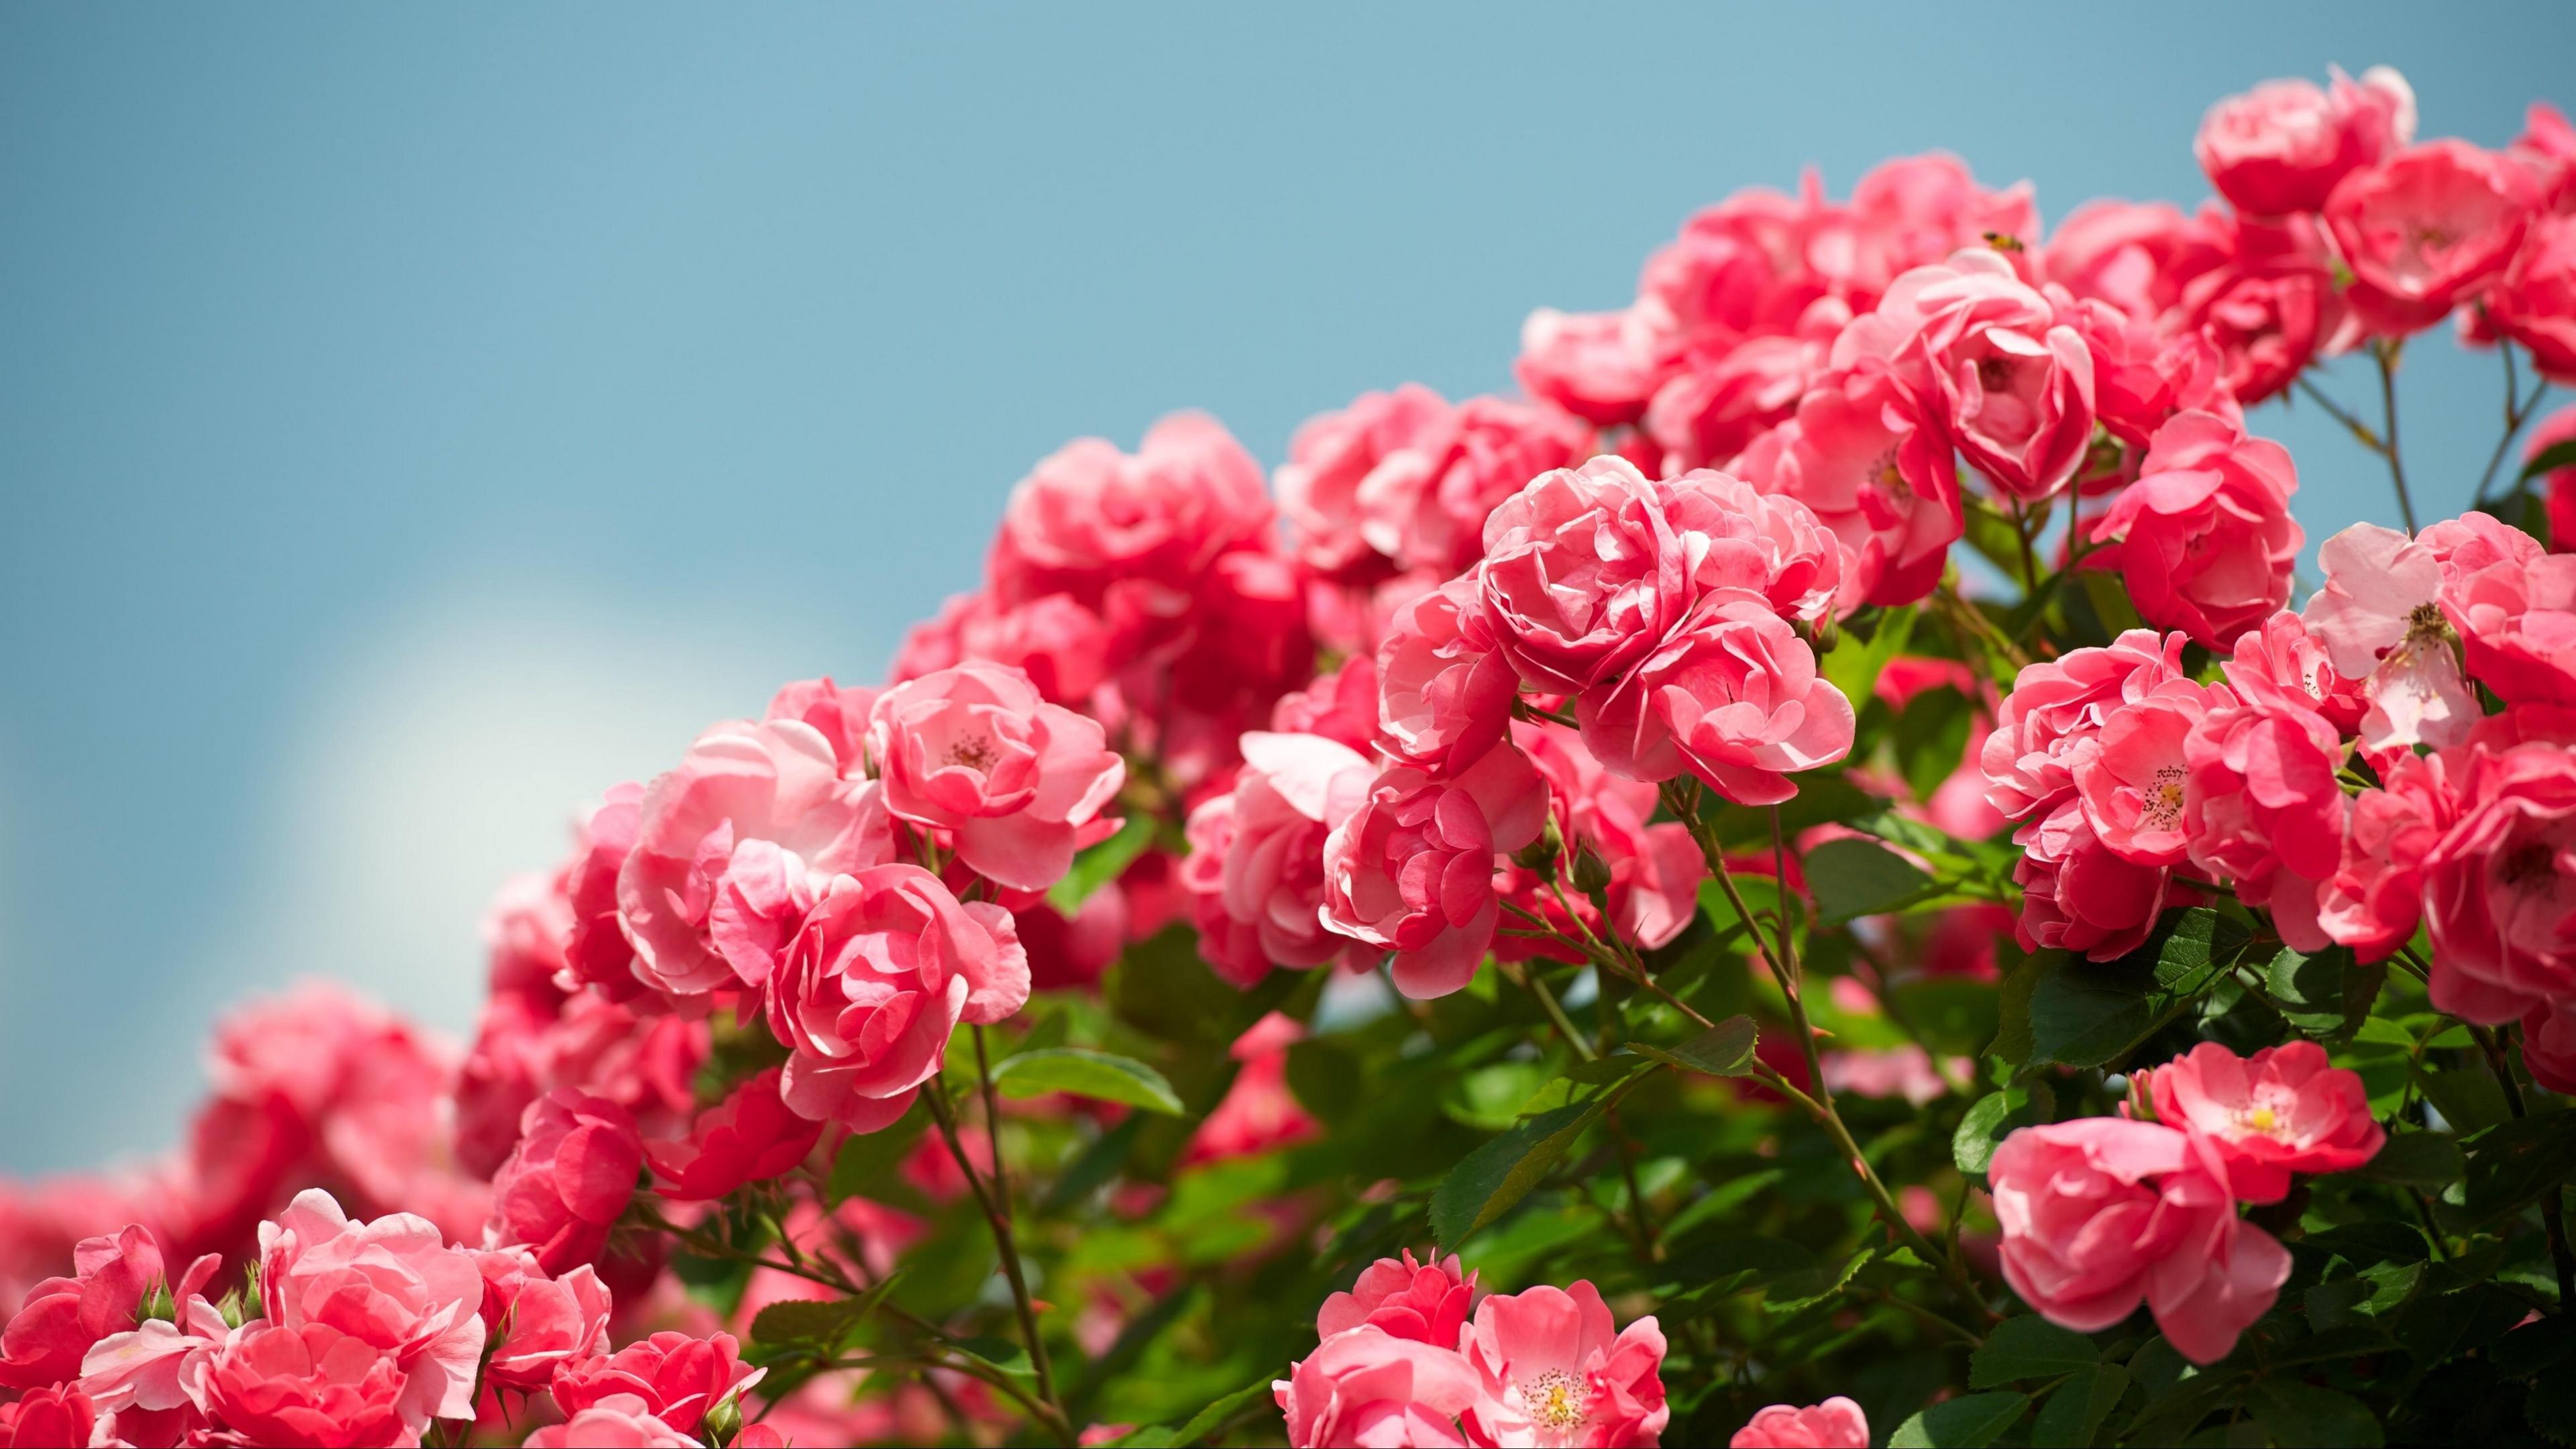 roses shrub sky sharpness beautiful 4k 1540065237 - roses, shrub, sky, sharpness, beautiful 4k - Sky, shrub, Roses